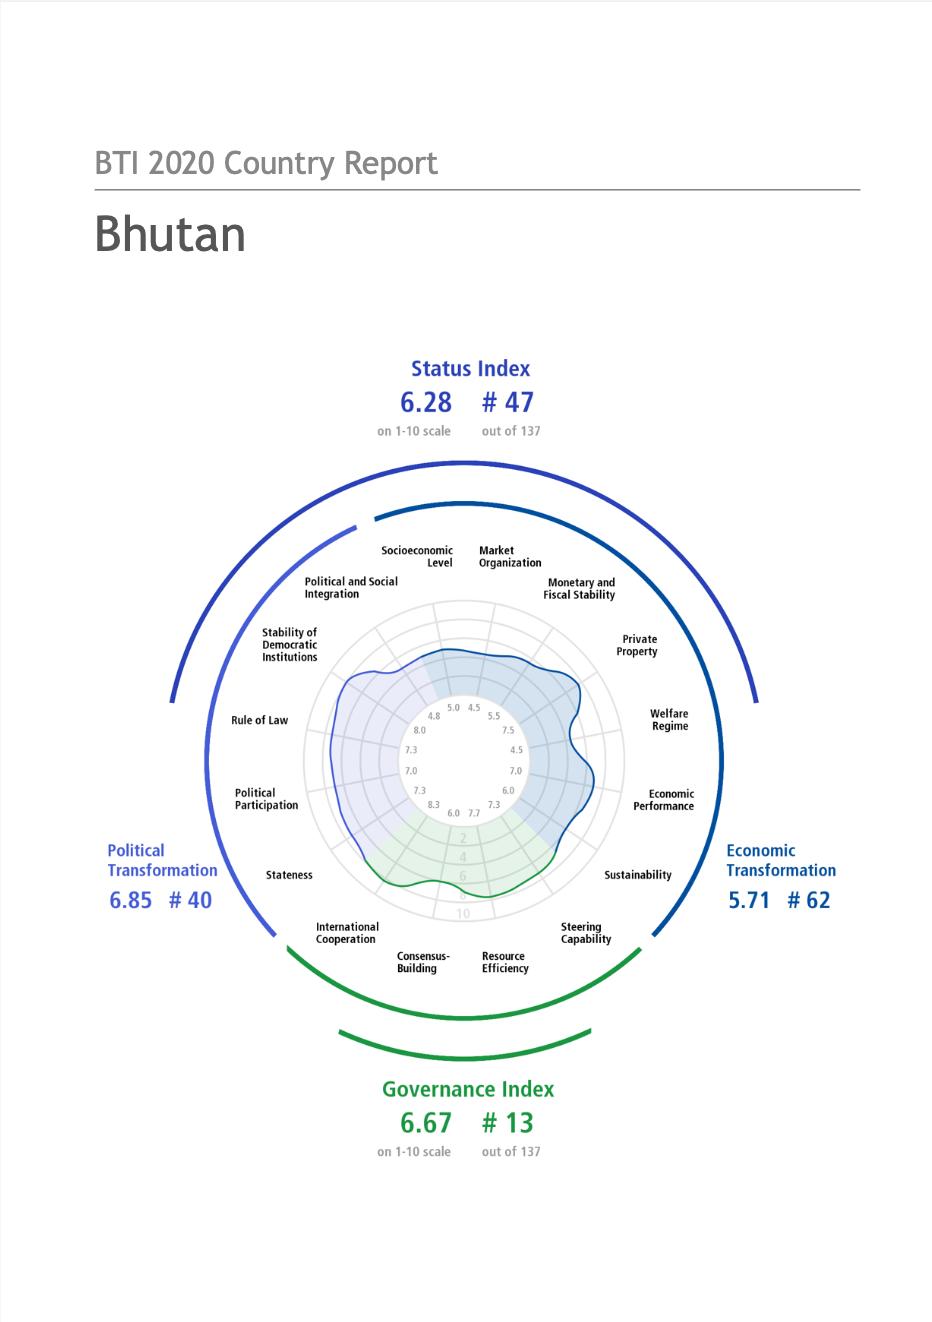 BTI 2020 Country Report: Bhutan